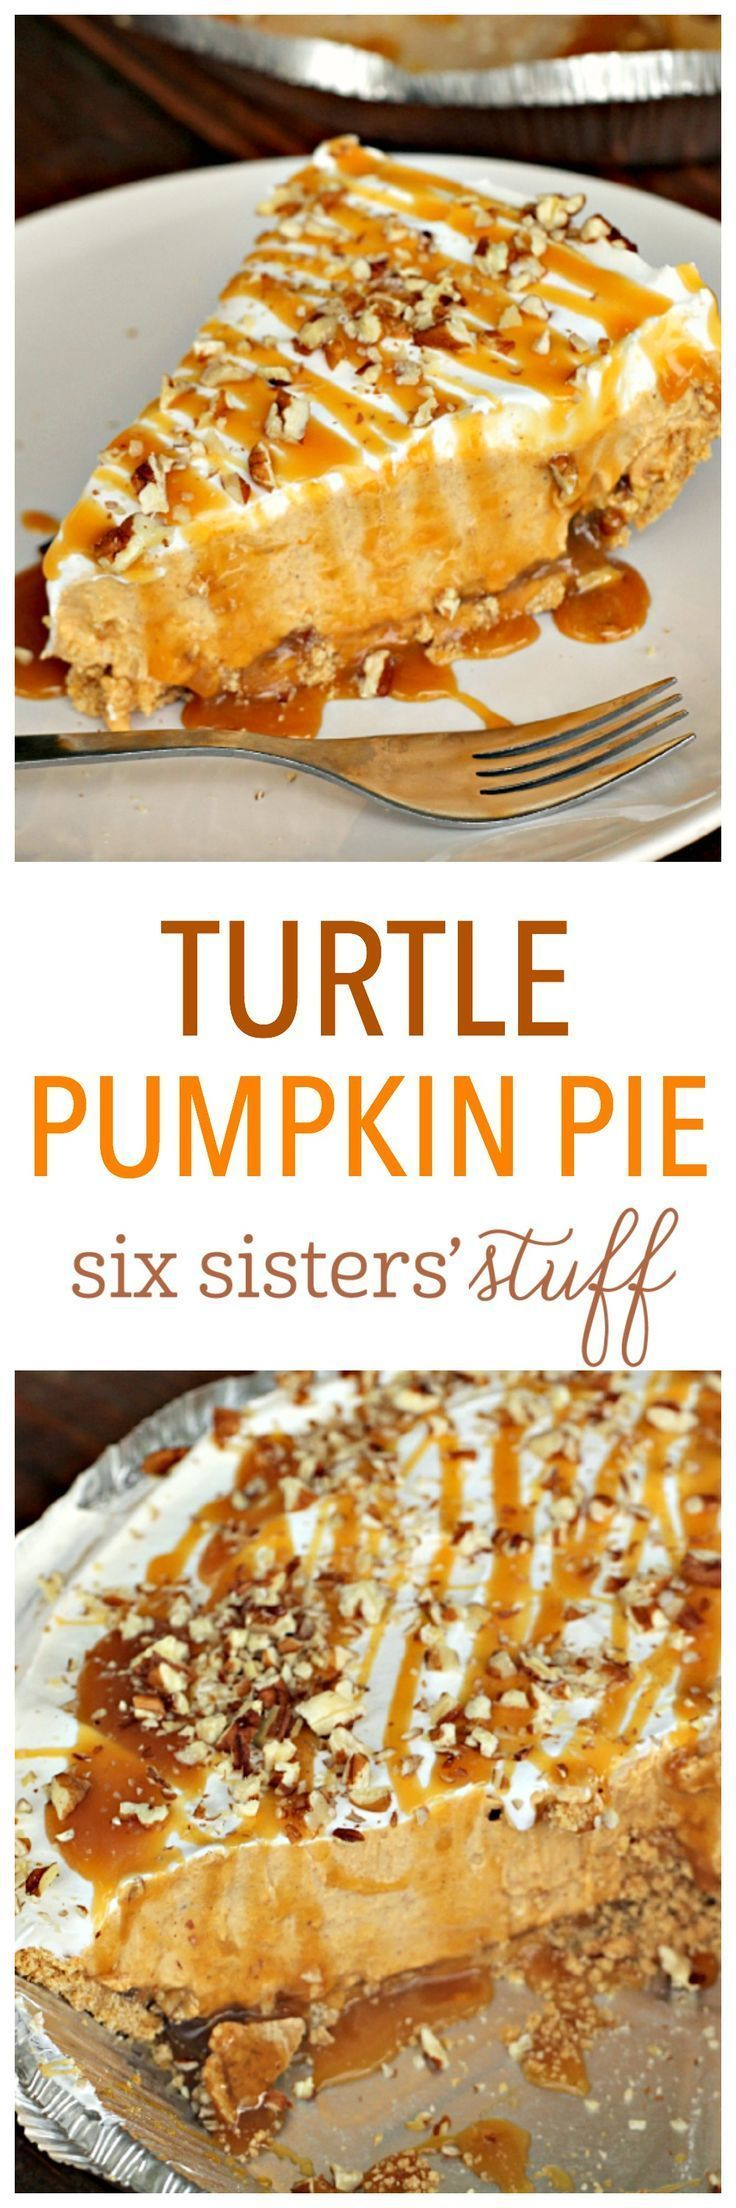 Turtle Pumpkin Pie on SixSistersStuff.com | Best Fall Recipes | Amazing Desserts | Thanksgiving Ideas